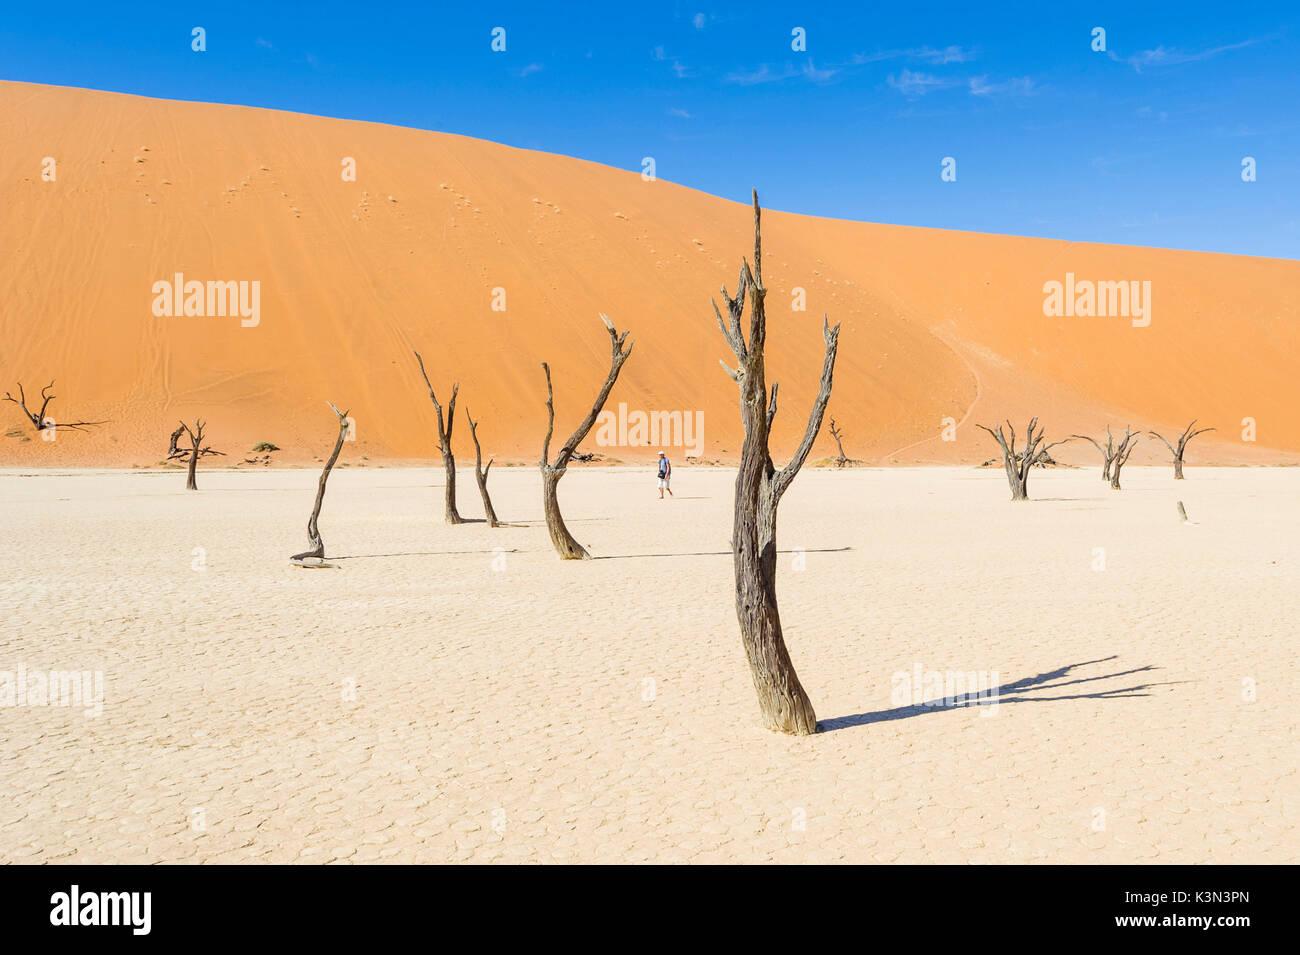 Deadvlei, Namib-Naukluft National Park, Namibia, Africa. Man walking into the dead acacias salt pan. - Stock Image